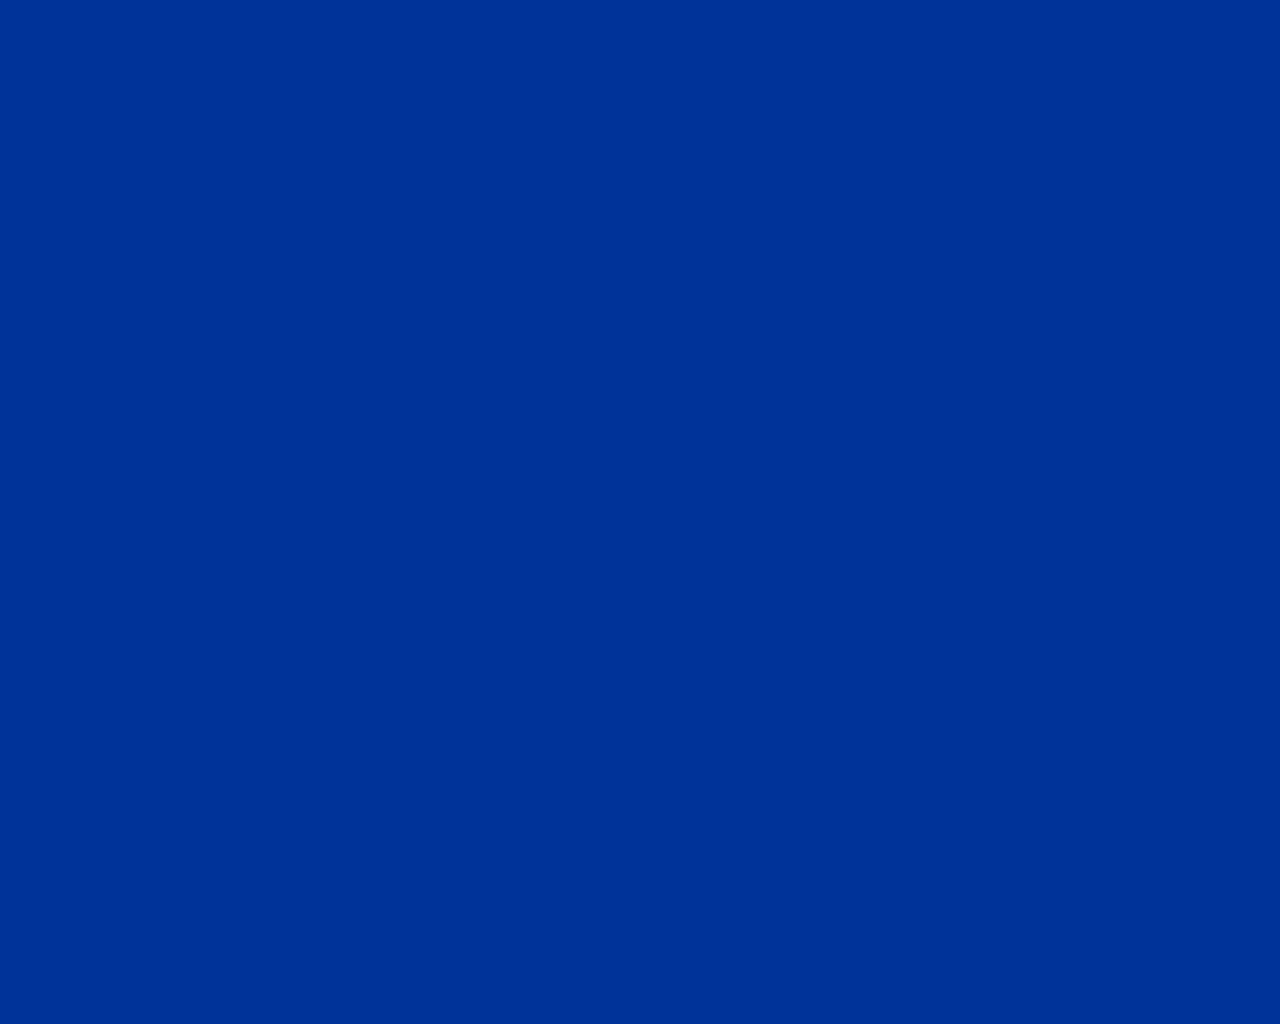 1280x1024 resolution Smalt Dark Powder Blue solid color 1280x1024